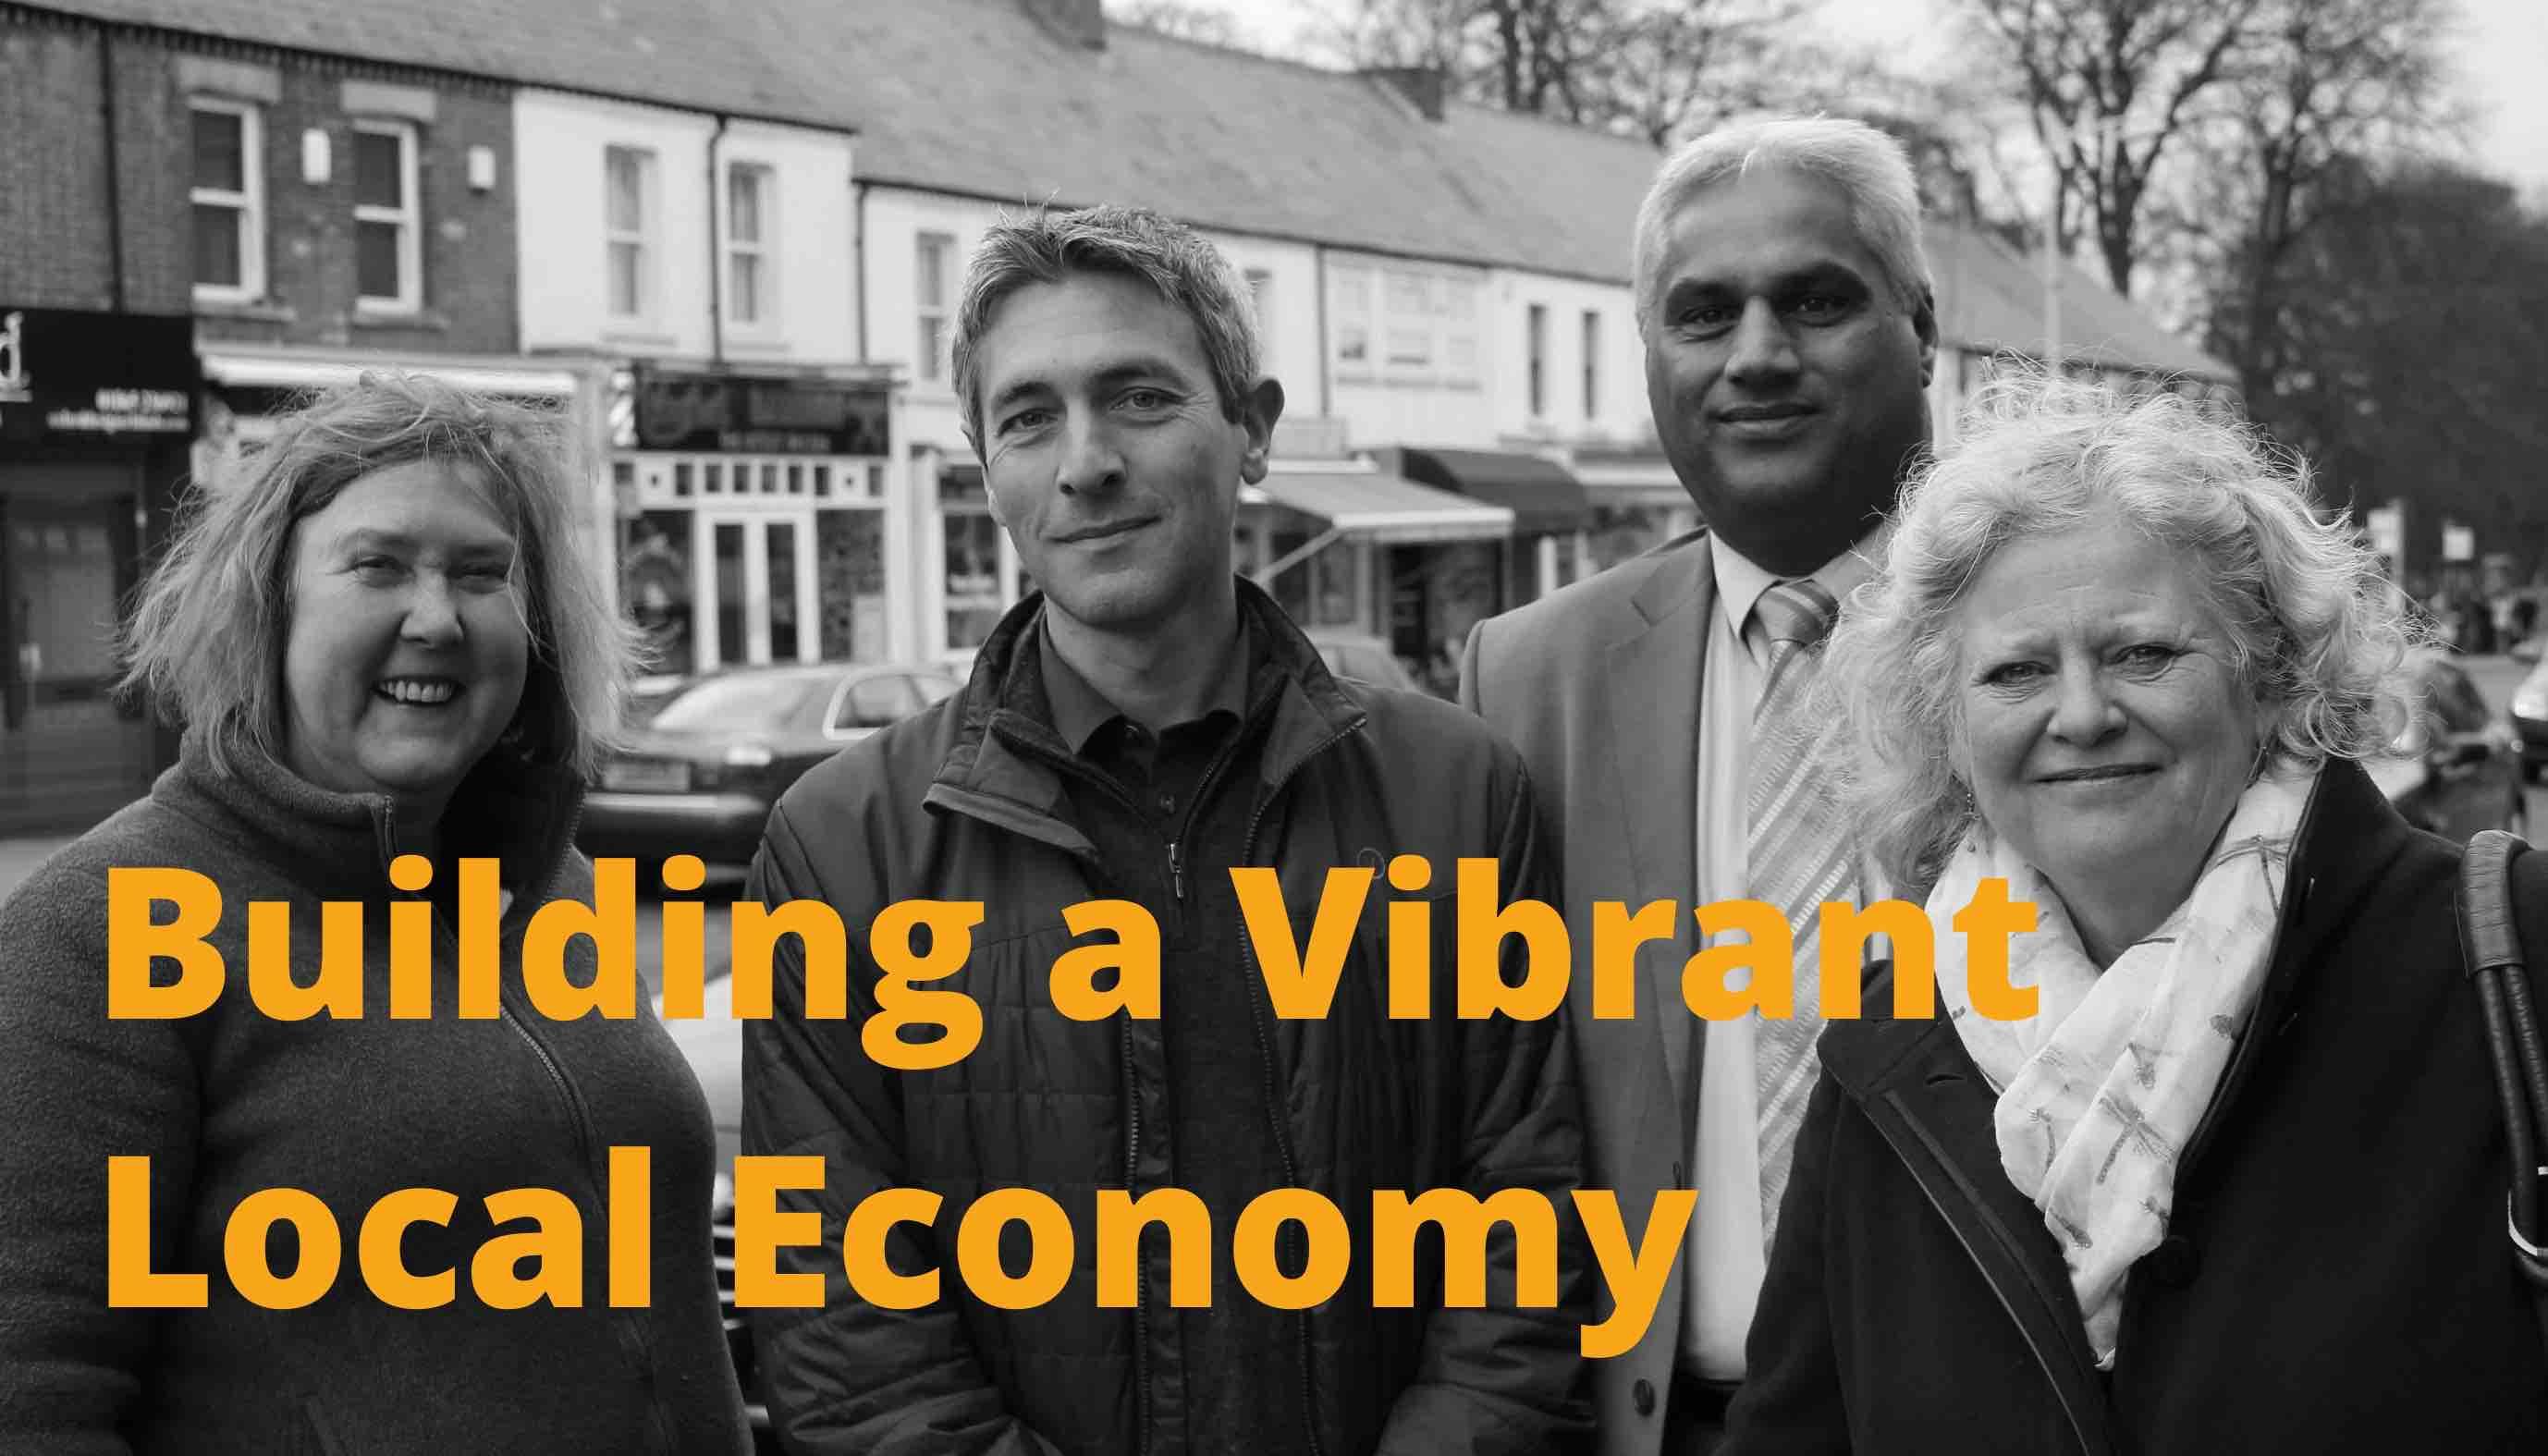 Building a Vibrant Local Economy